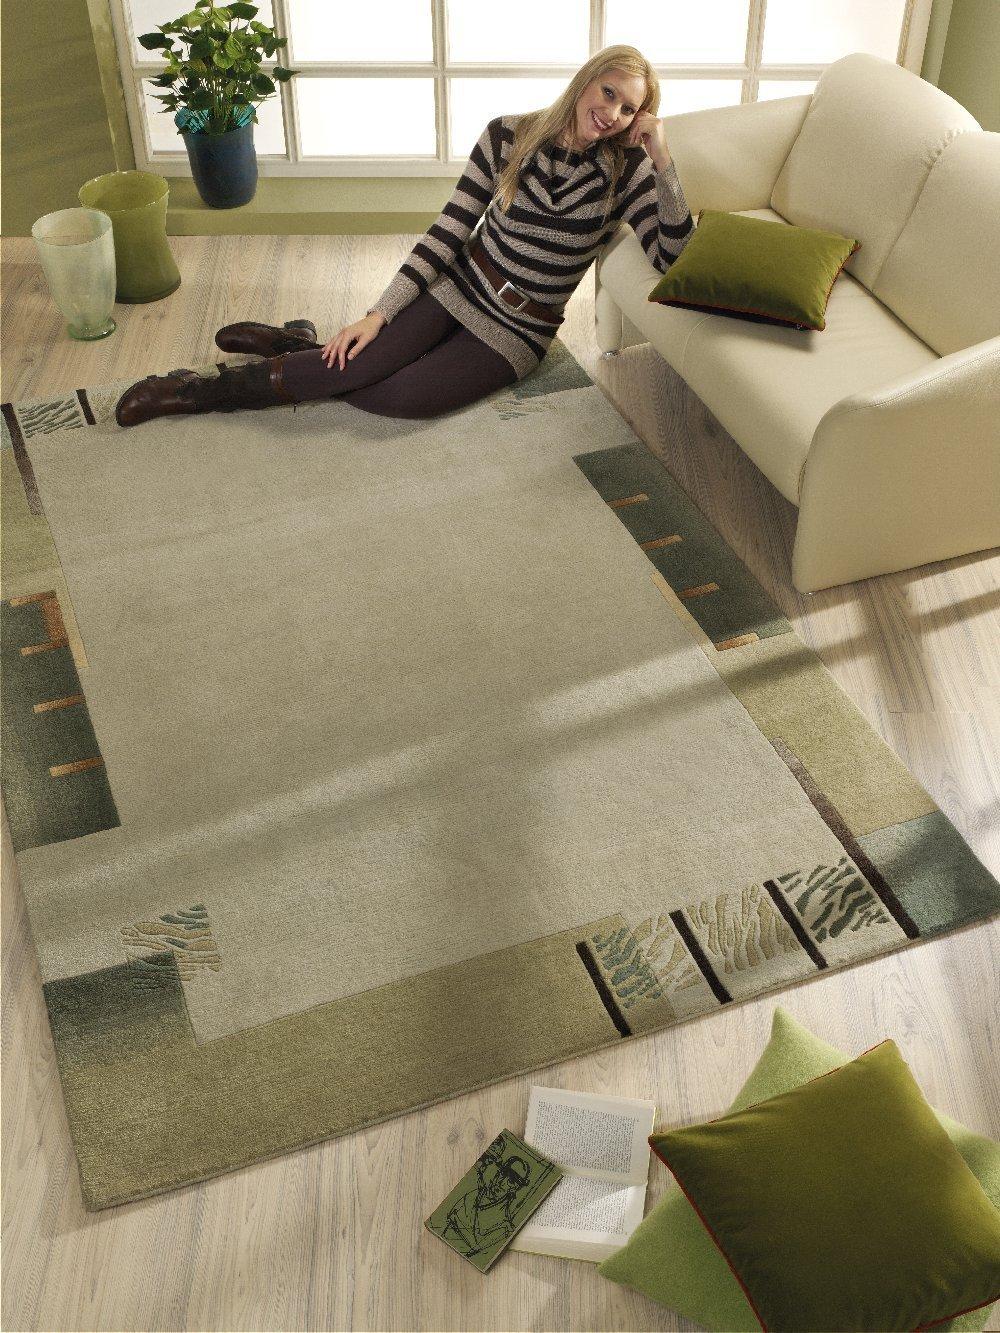 luxor living nepal teppich handgekn pft lind gr e. Black Bedroom Furniture Sets. Home Design Ideas